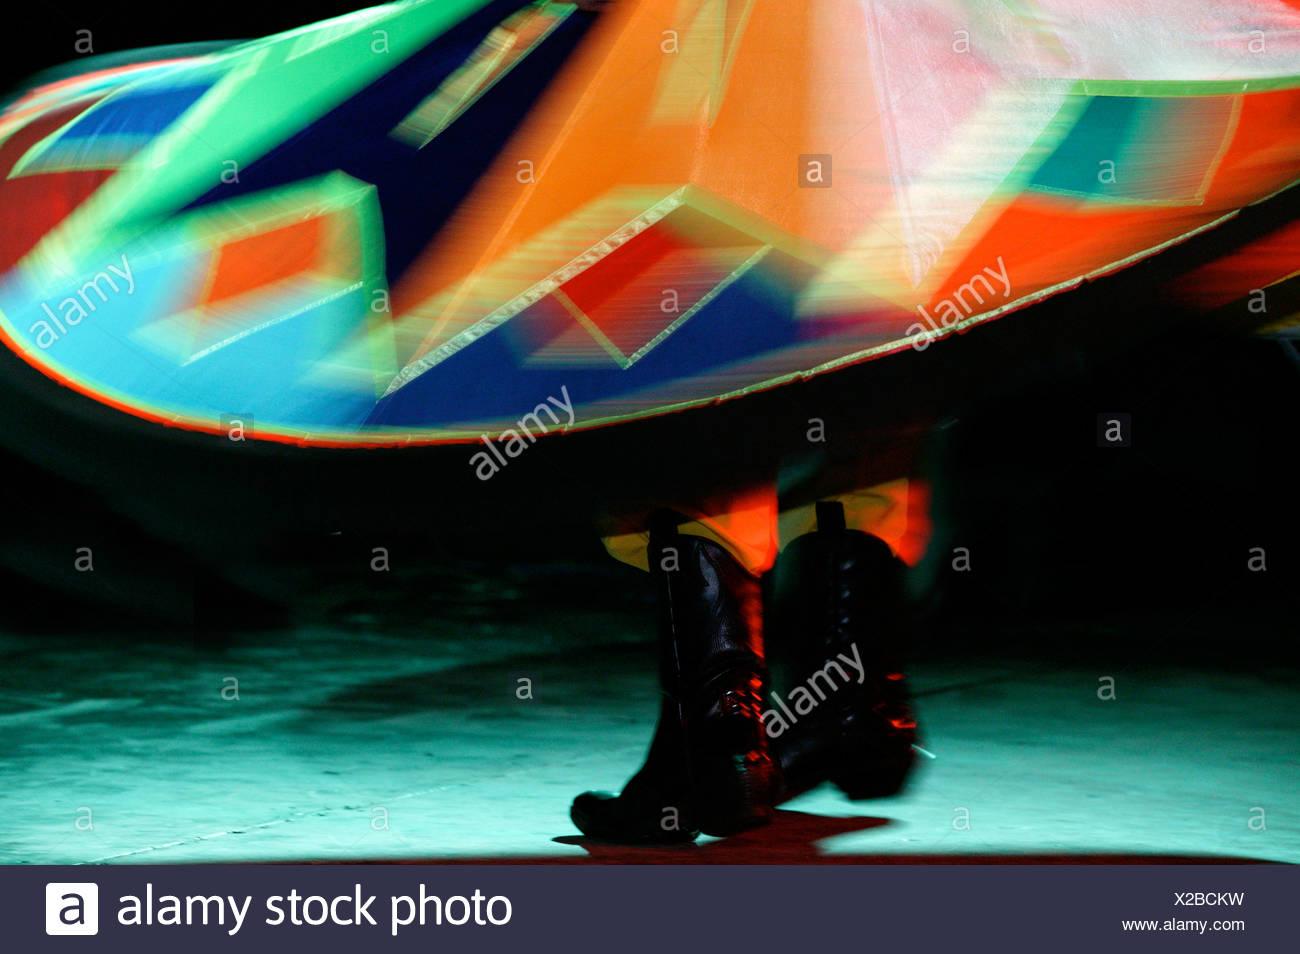 Egytian dancer Saeed the Tannoura whirling dervish dancer - Stock Image